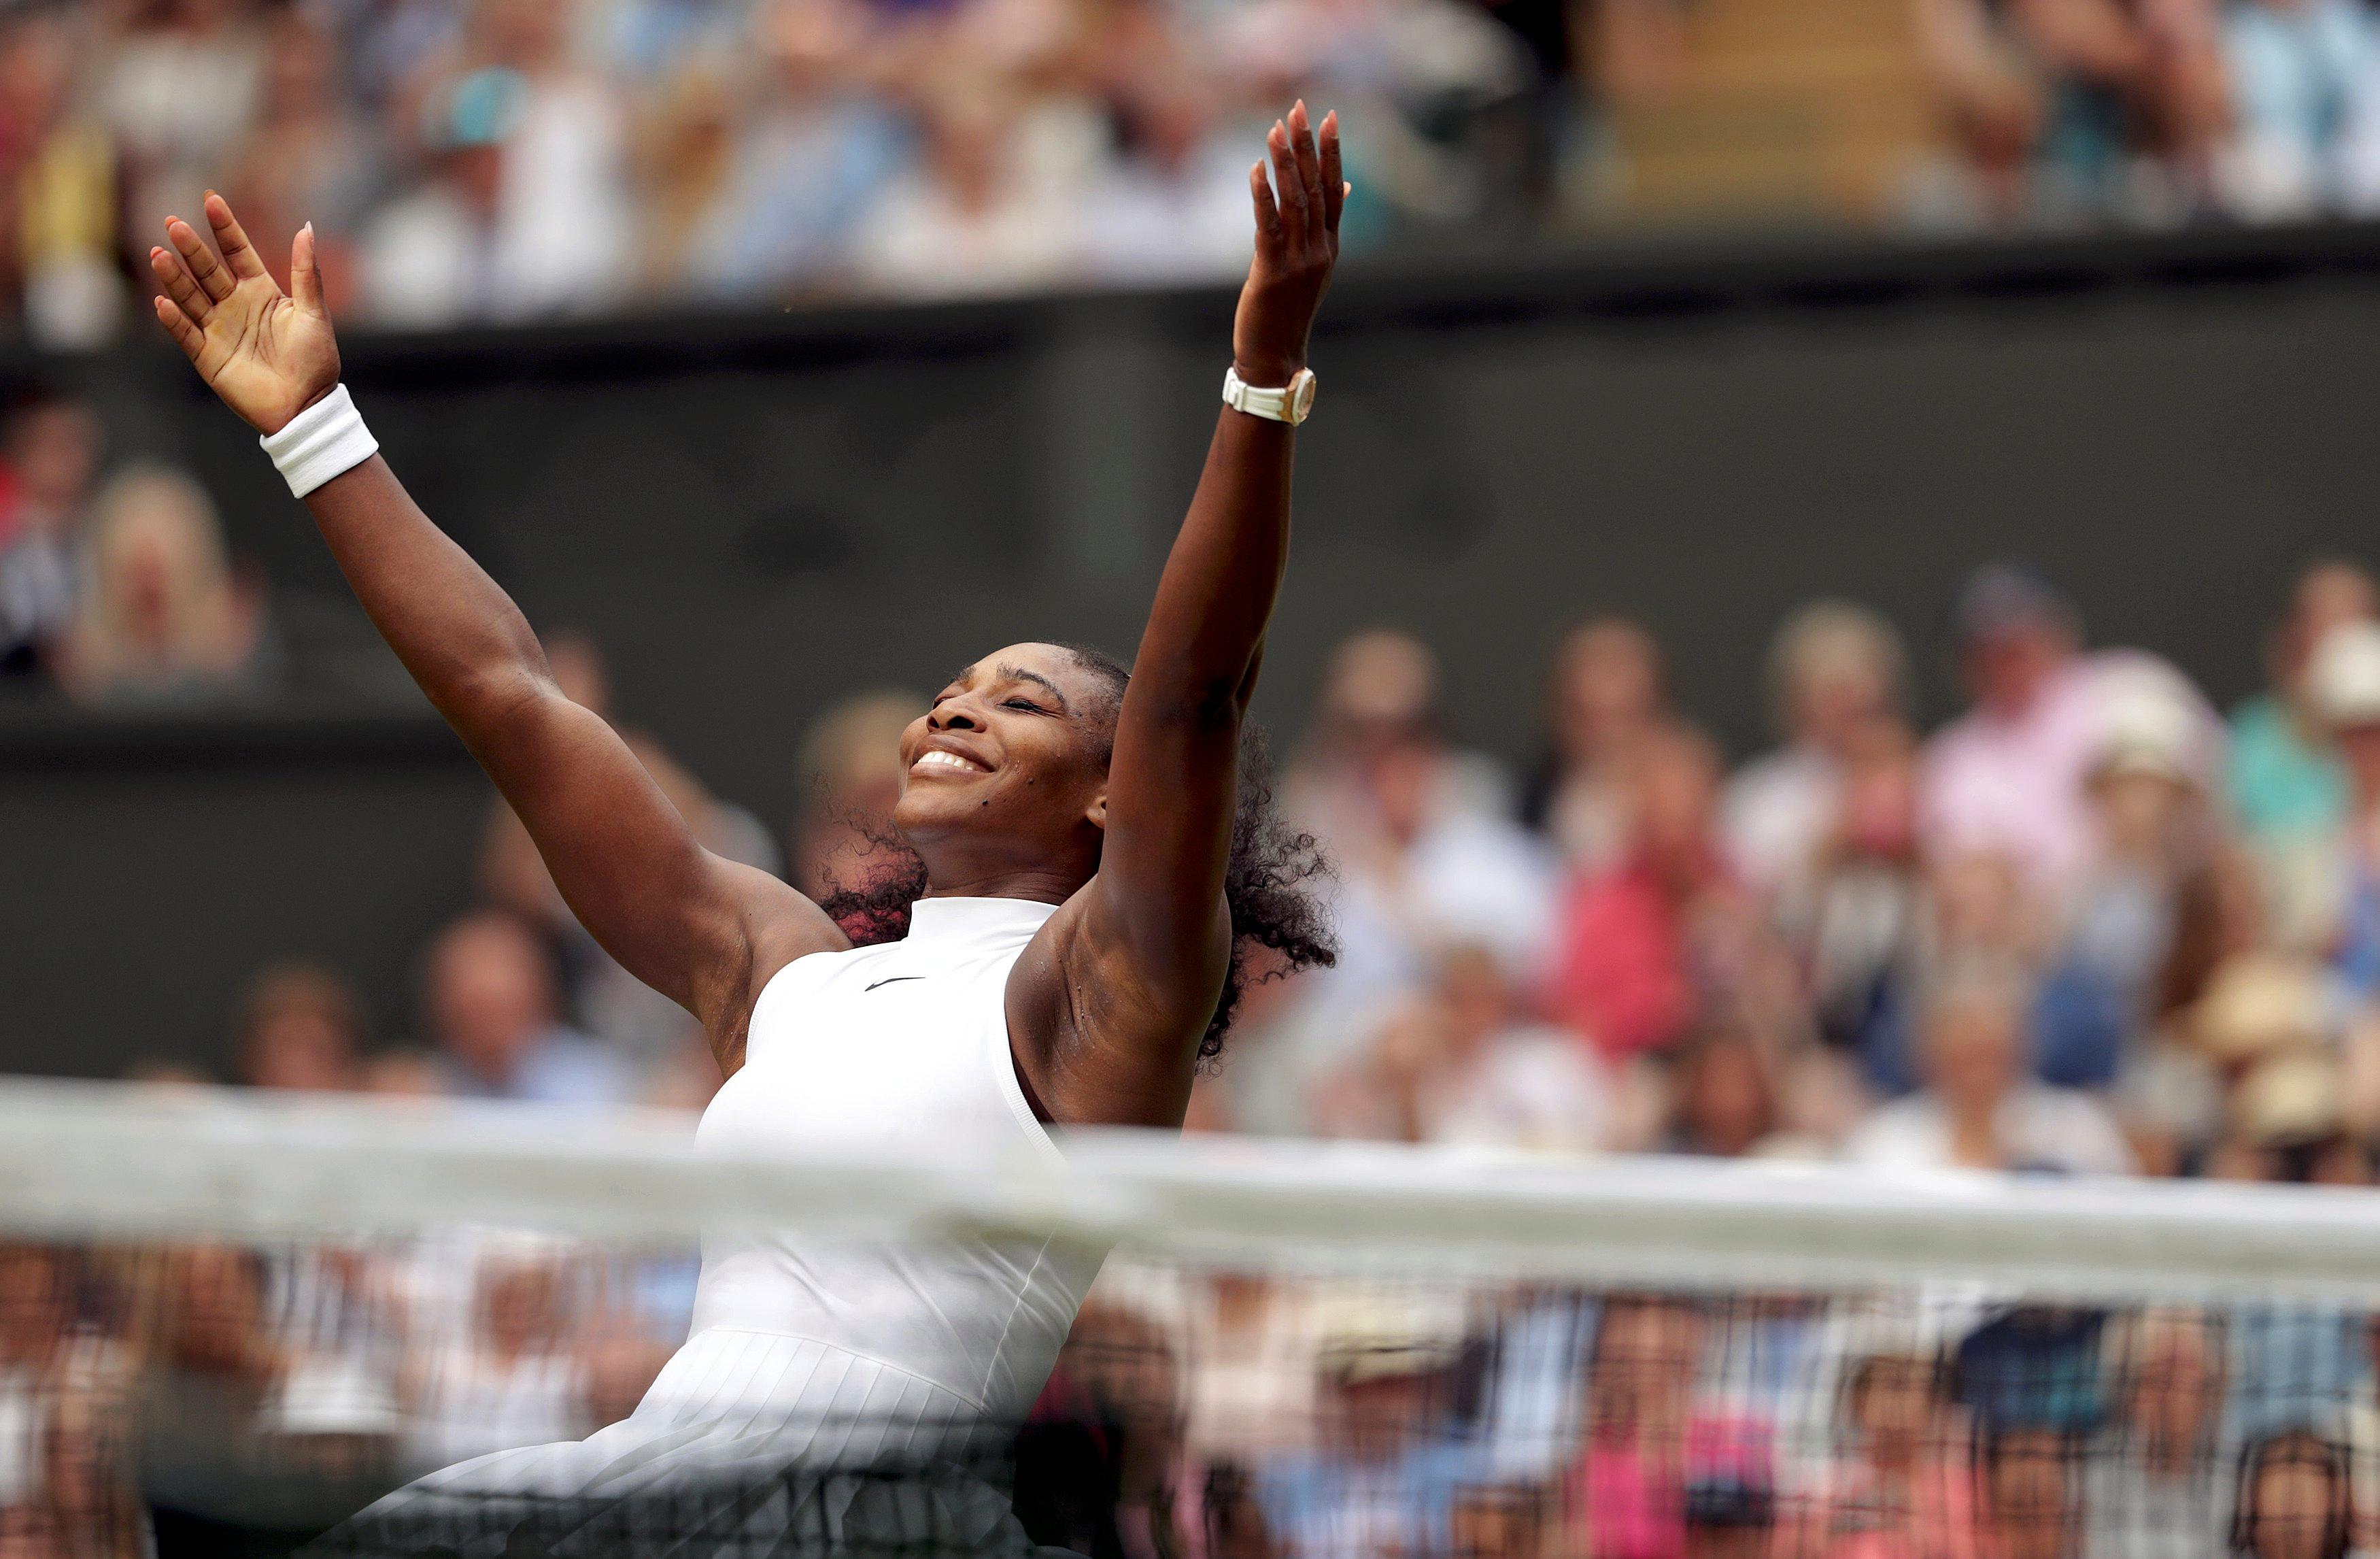 Britain Tennis - Wimbledon - All England Lawn Tennis & Croquet Club, Wimbledon, England - 9/7/16 USA's Serena Williams celebrates winning her womens singles final match against Germany's Angelique Kerber REUTERS/Adam Davy/Pool